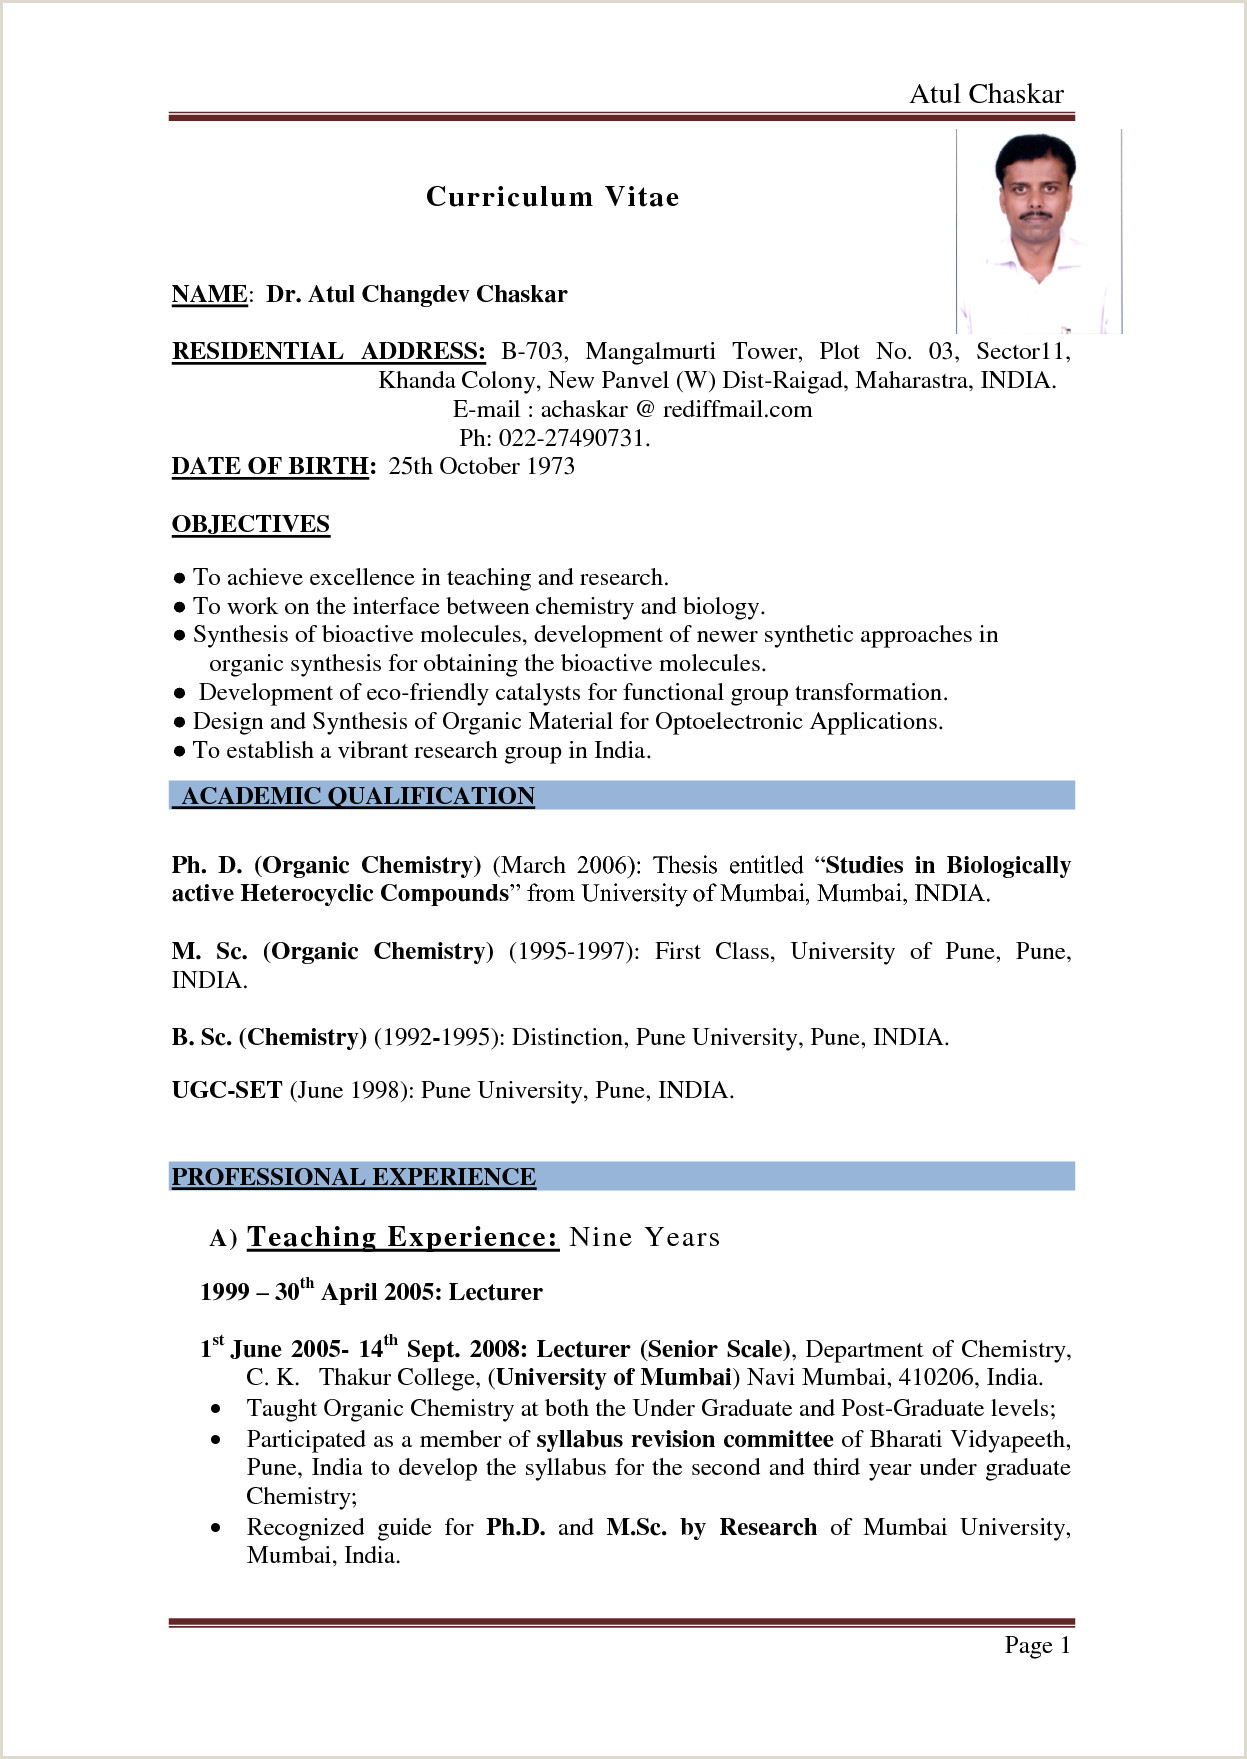 Fresher Teacher Cv format In Word Part 2 Resume format Examples